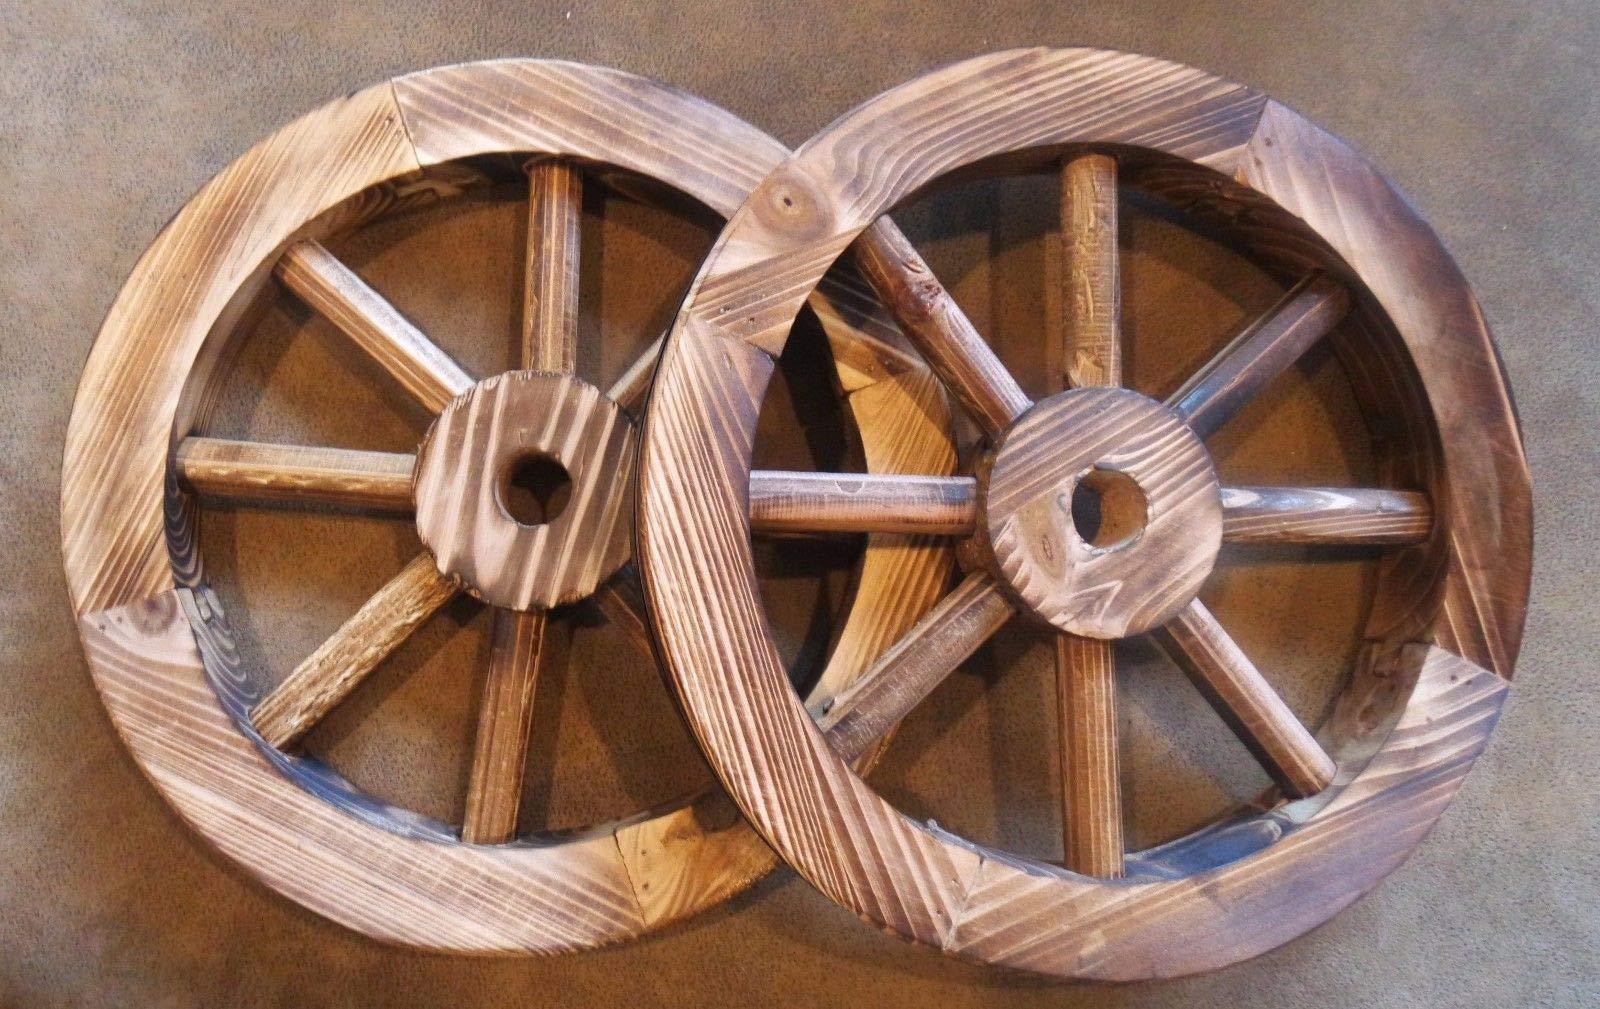 Galapagoz Wooden Wagon Wheels Burnt Wood Wheel Look Garden Decor Table Centerpiece Decorative 12'' 2 Pack US by Galapagoz (Image #1)